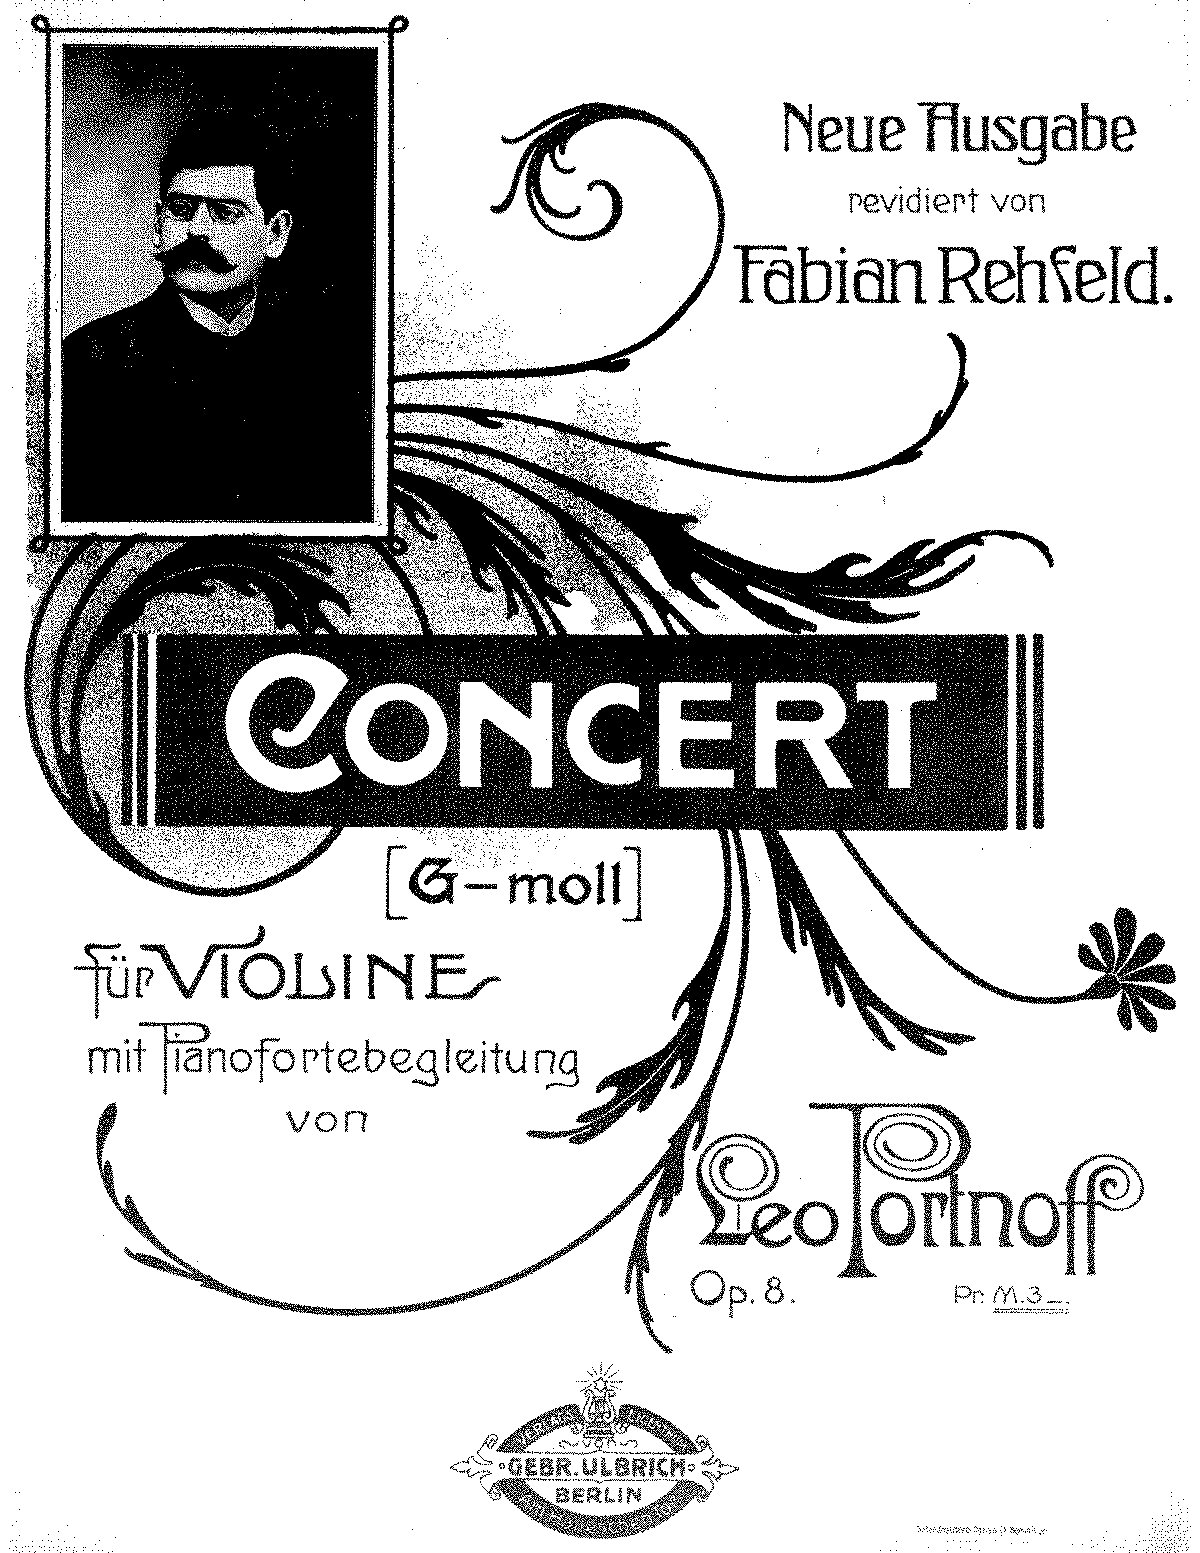 Violin Concerto, Op 8 (Portnoff, Leo) - IMSLP/Petrucci Music